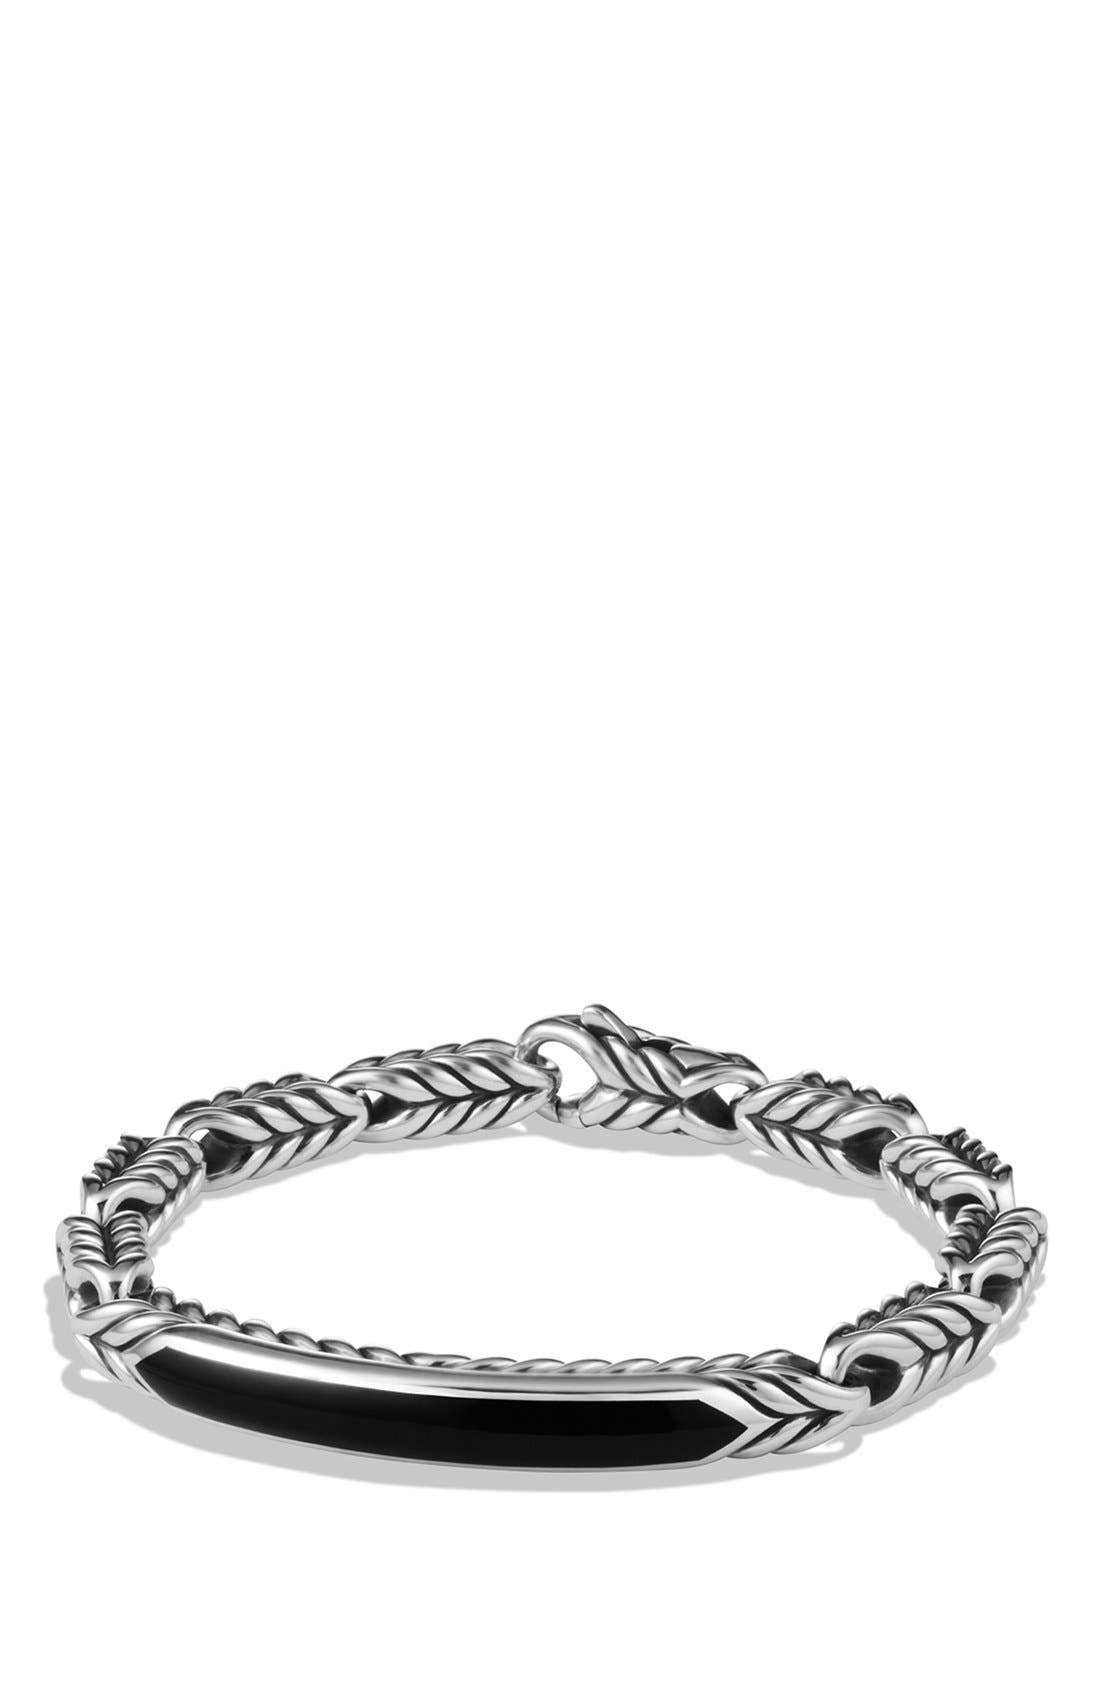 DAVID YURMAN Chevron ID Bracelet